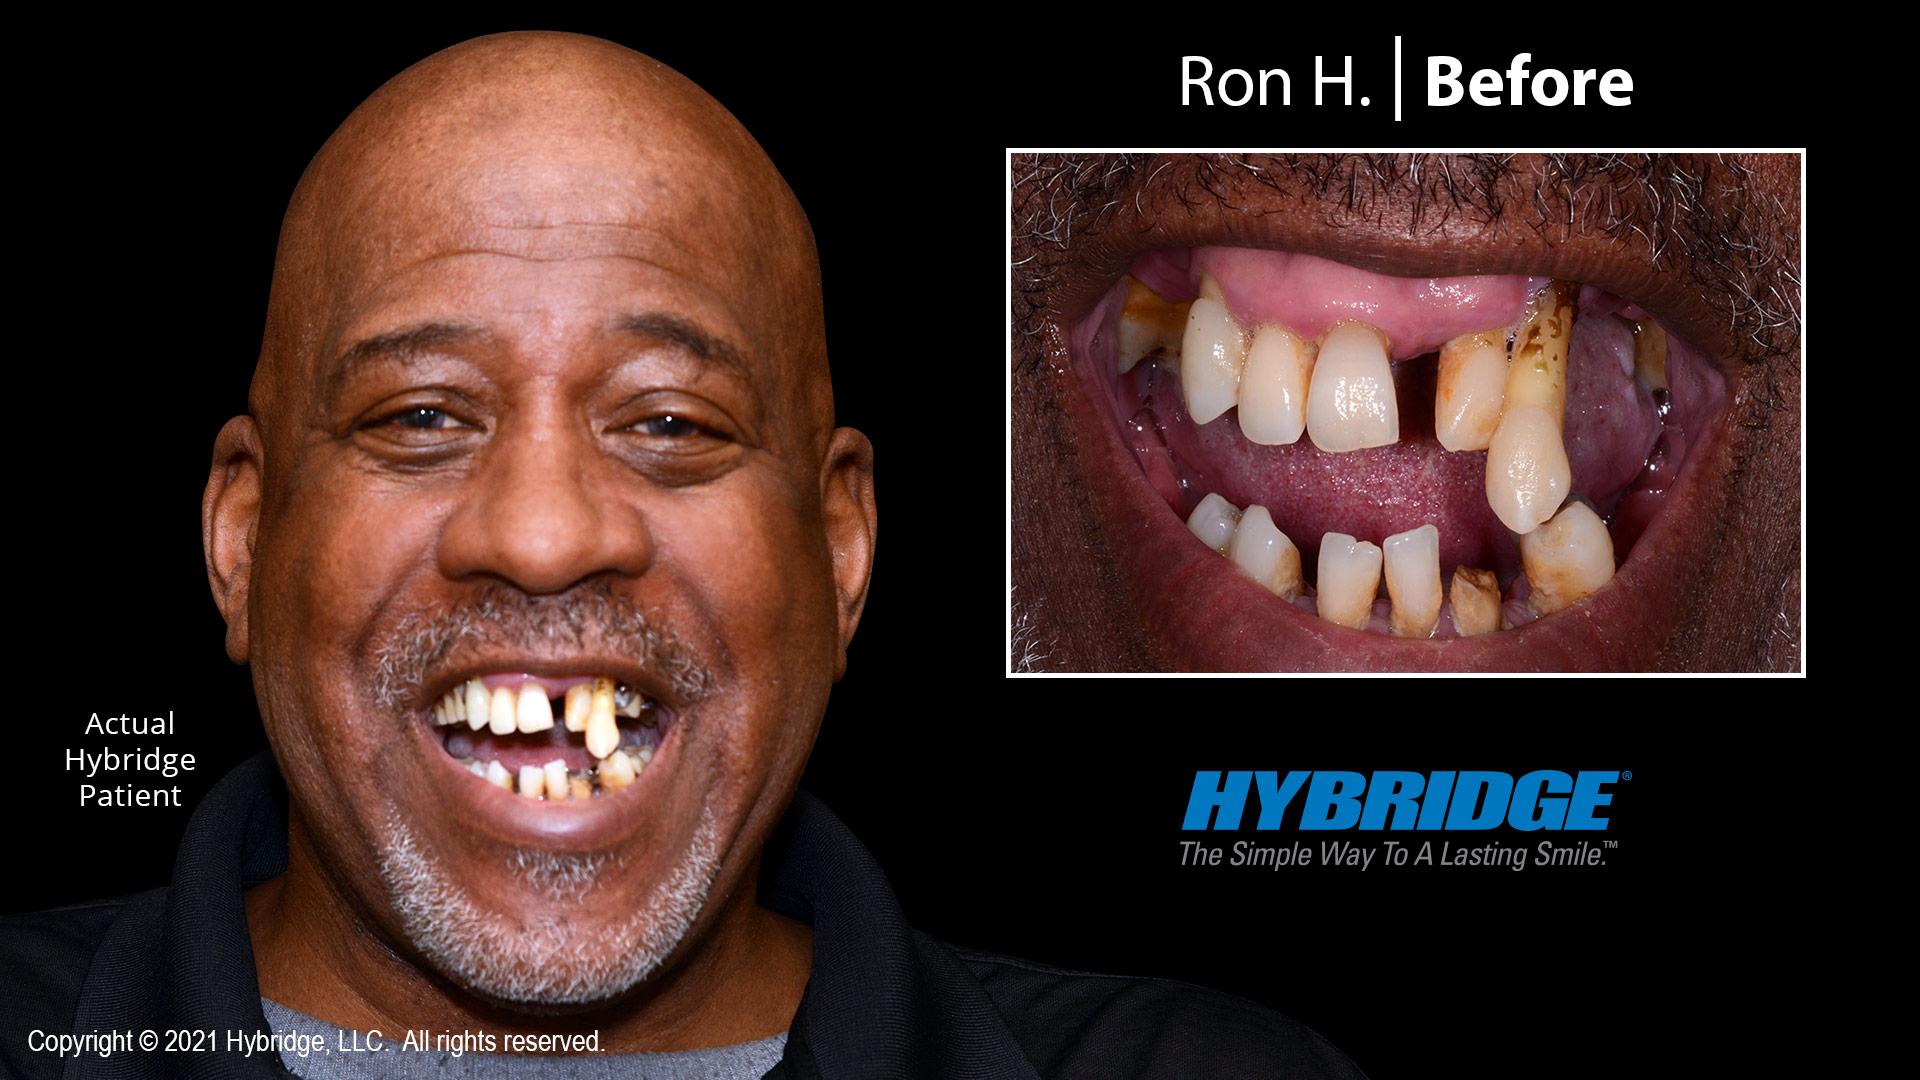 Hybridge-Smile-Gallery_Before_Ron-H_1920x1080